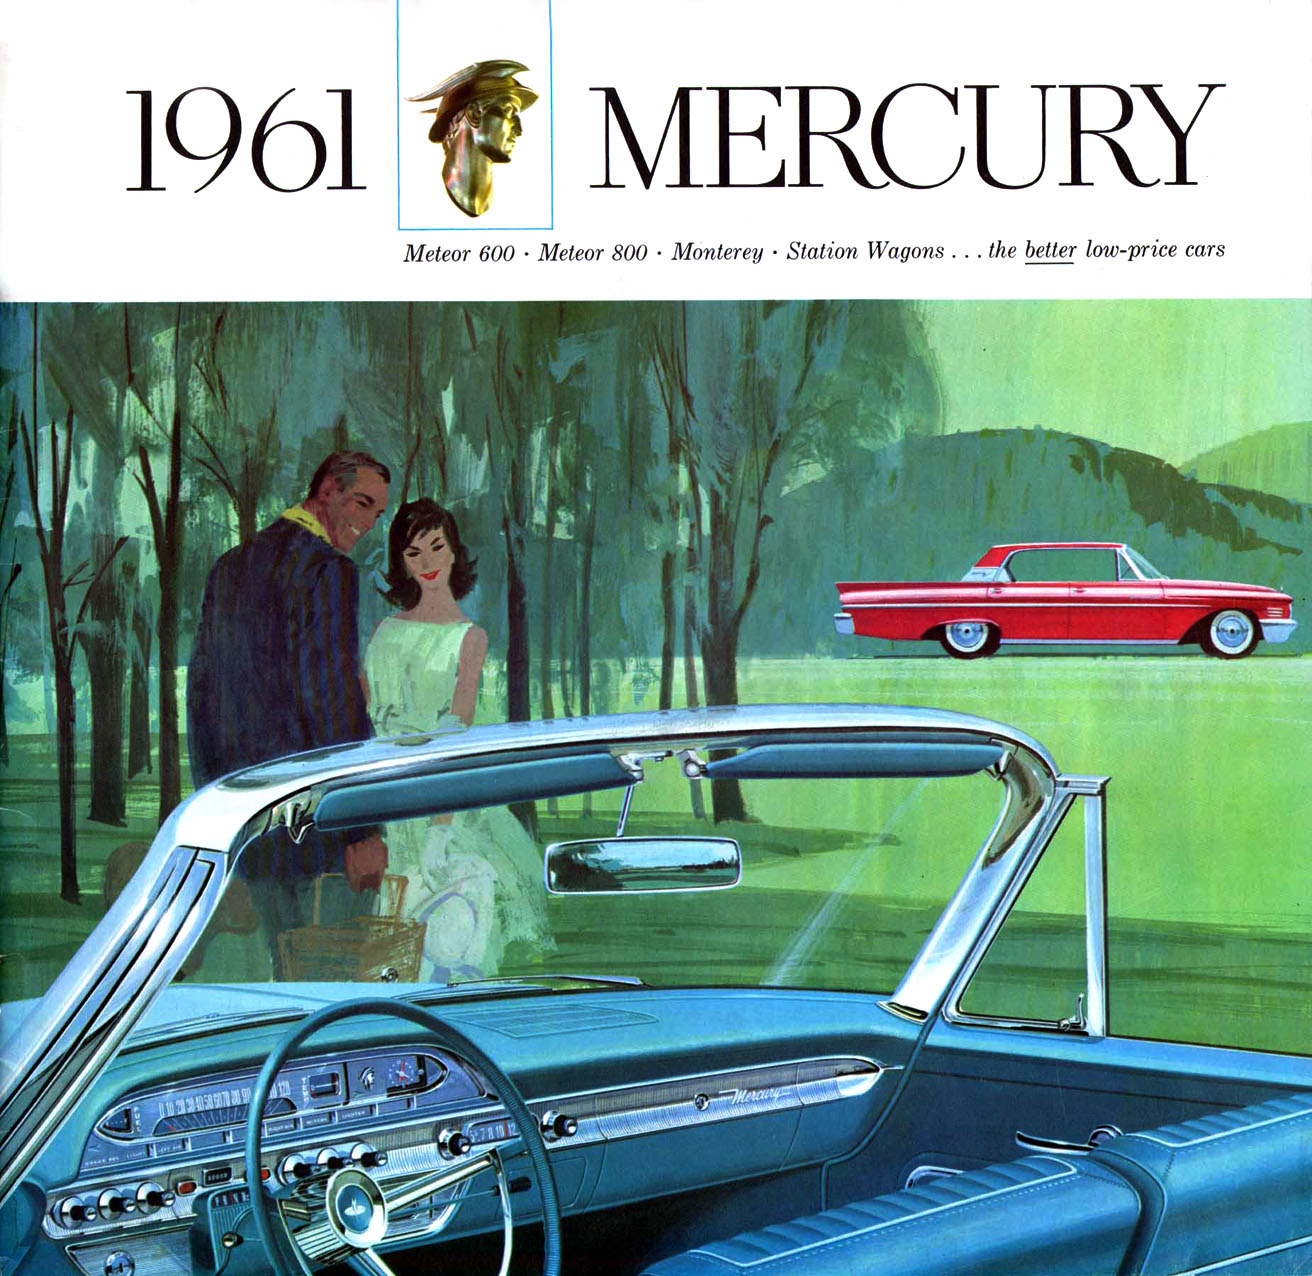 tunnelram.net_1961 Mercuy (1).jpg